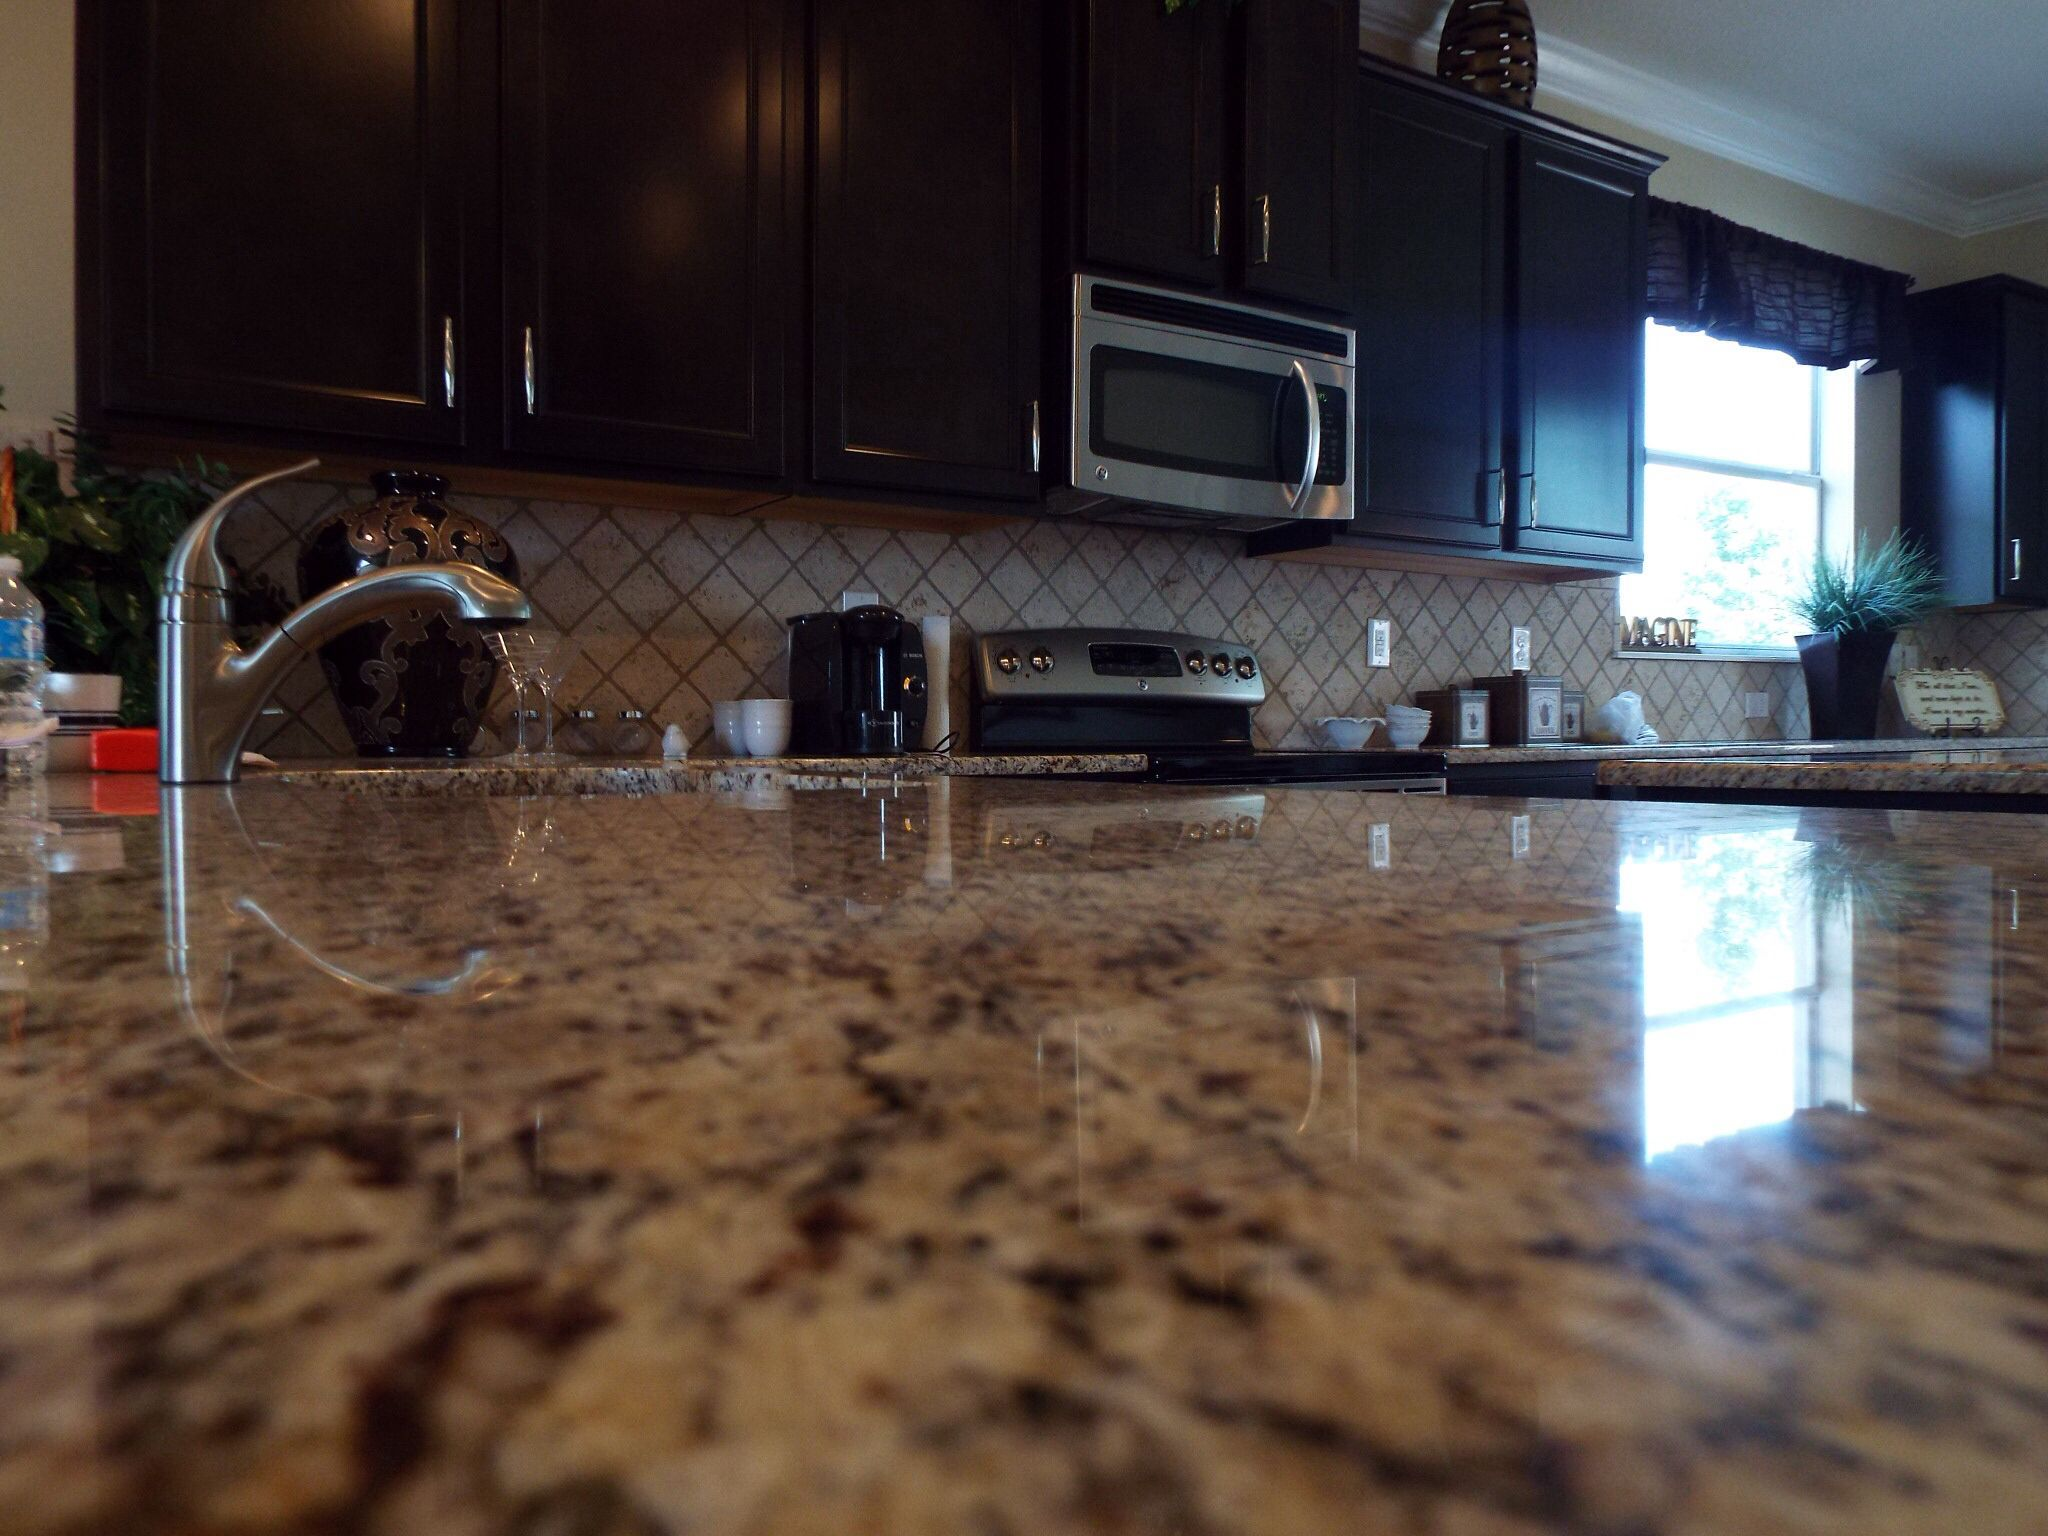 High Quality Granite Countertops, Sarsaparilla Color Aristakrat Cabinets In D.R.  Hortonu0027s Homes In Tampa, Florida.